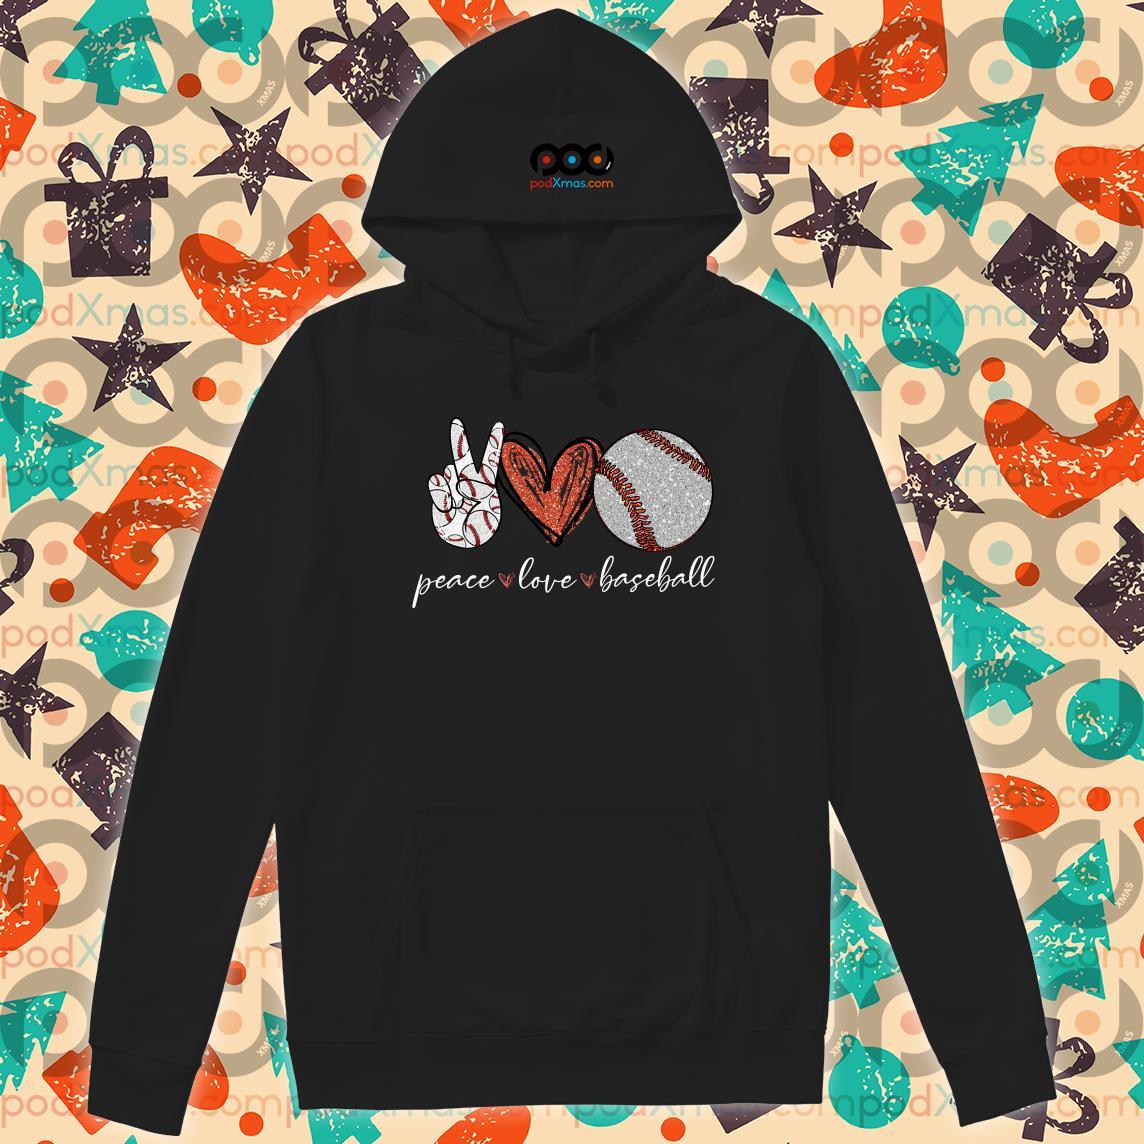 Peace love baseball hoodie